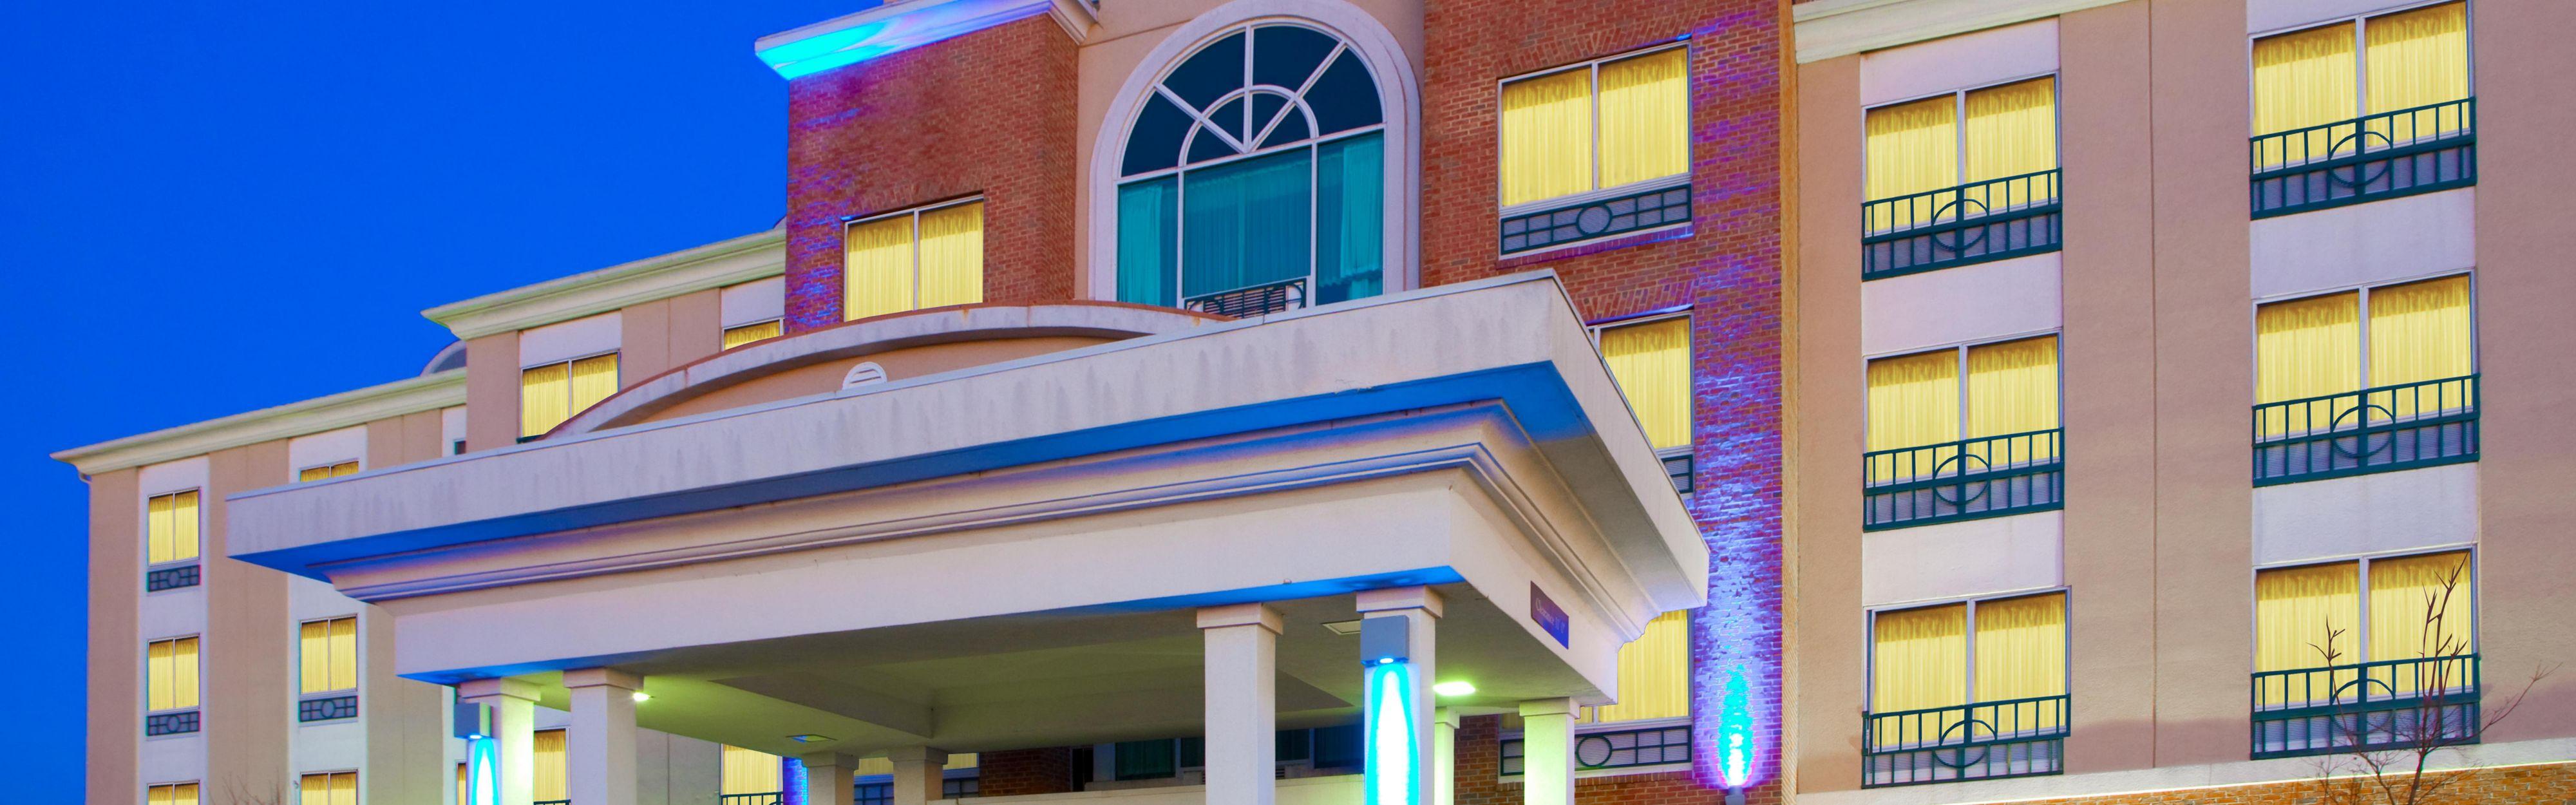 Holiday Inn Express & Suites Woodbridge image 0